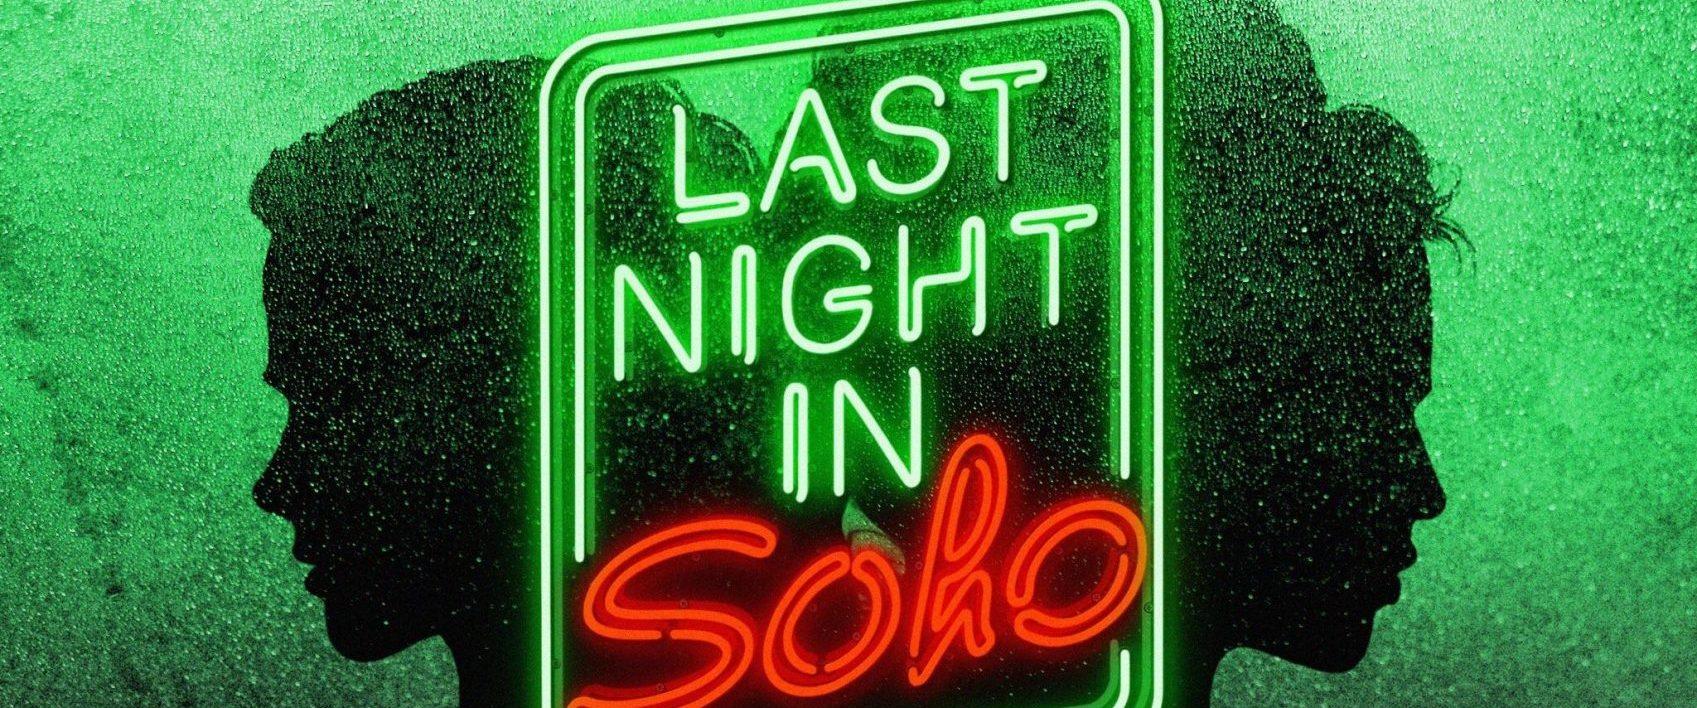 Last Night in Soho, la nuova pellicola horror di Edgar Wright thumbnail